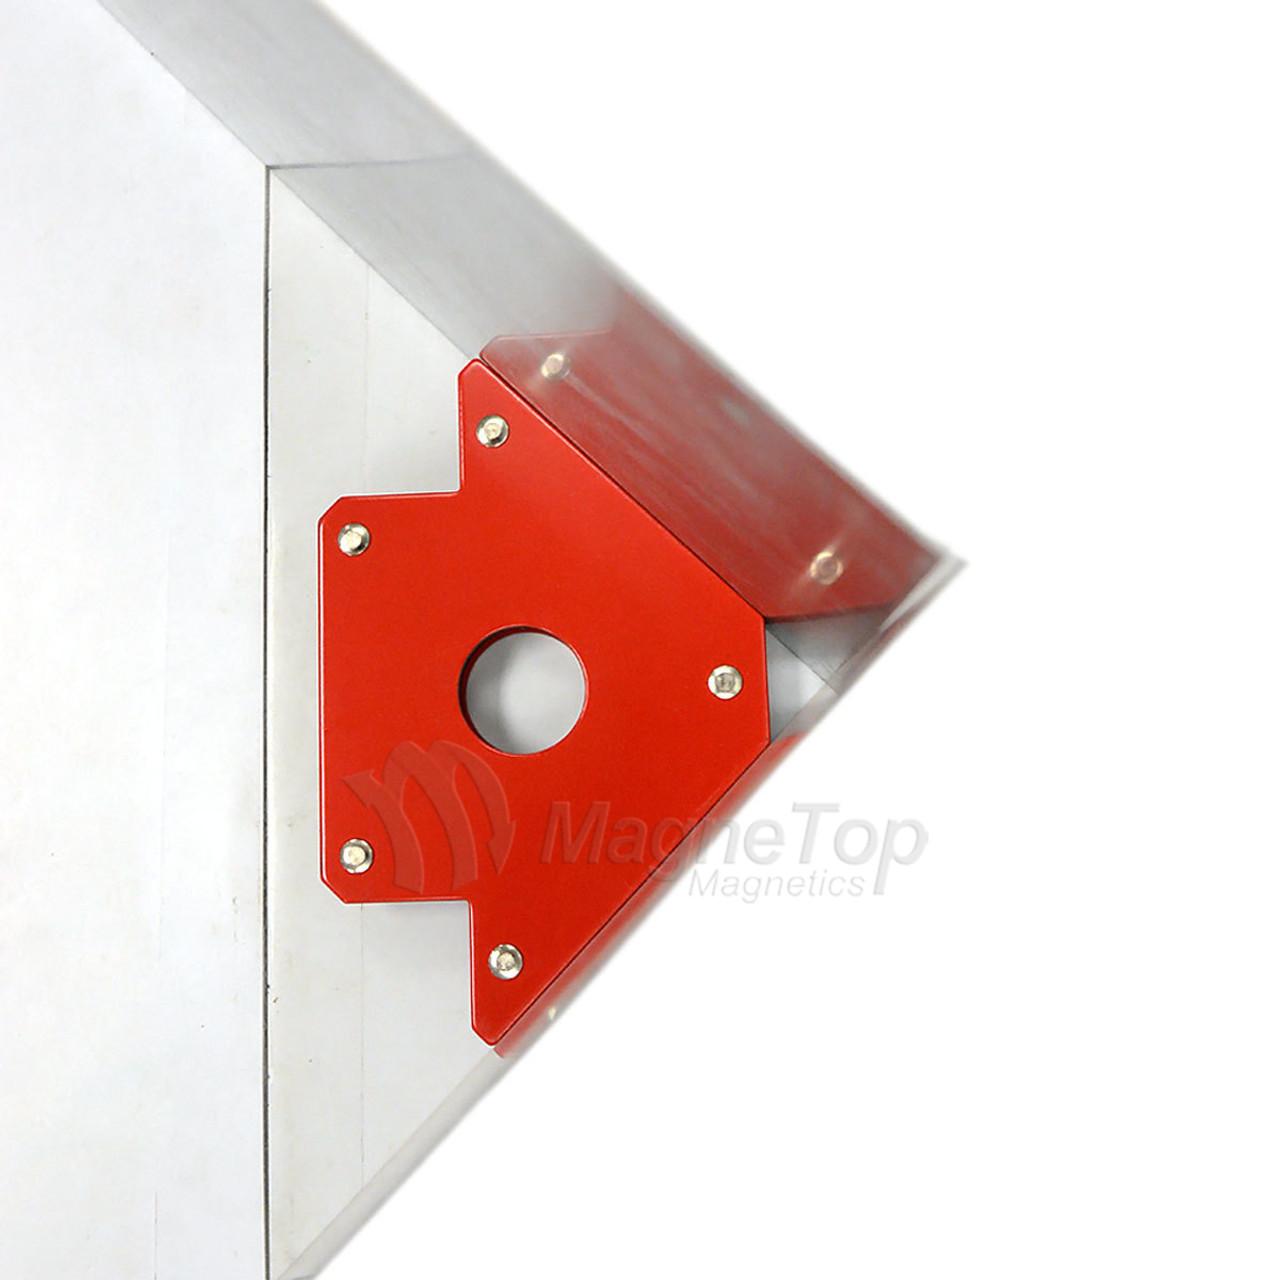 11kg (25lb) Magnetic Welding Holder